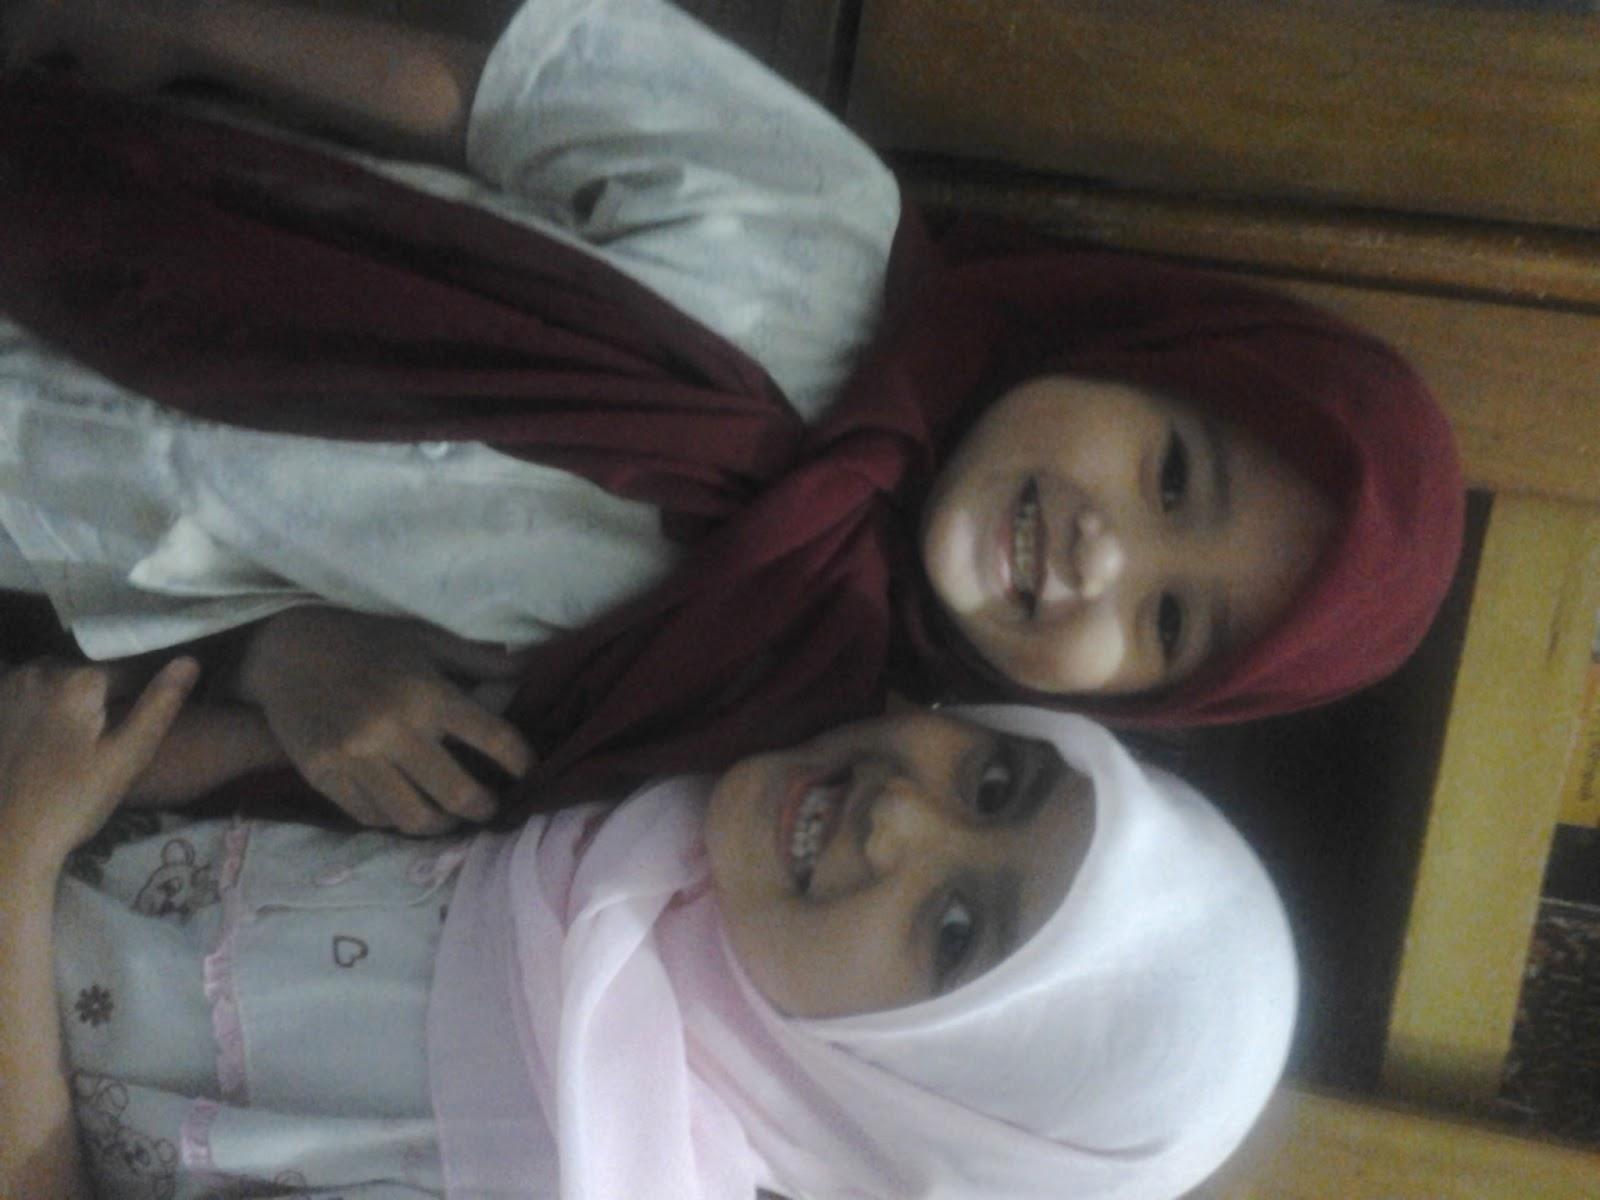 Fatihshollahuddinblogspotcom Little Sisters